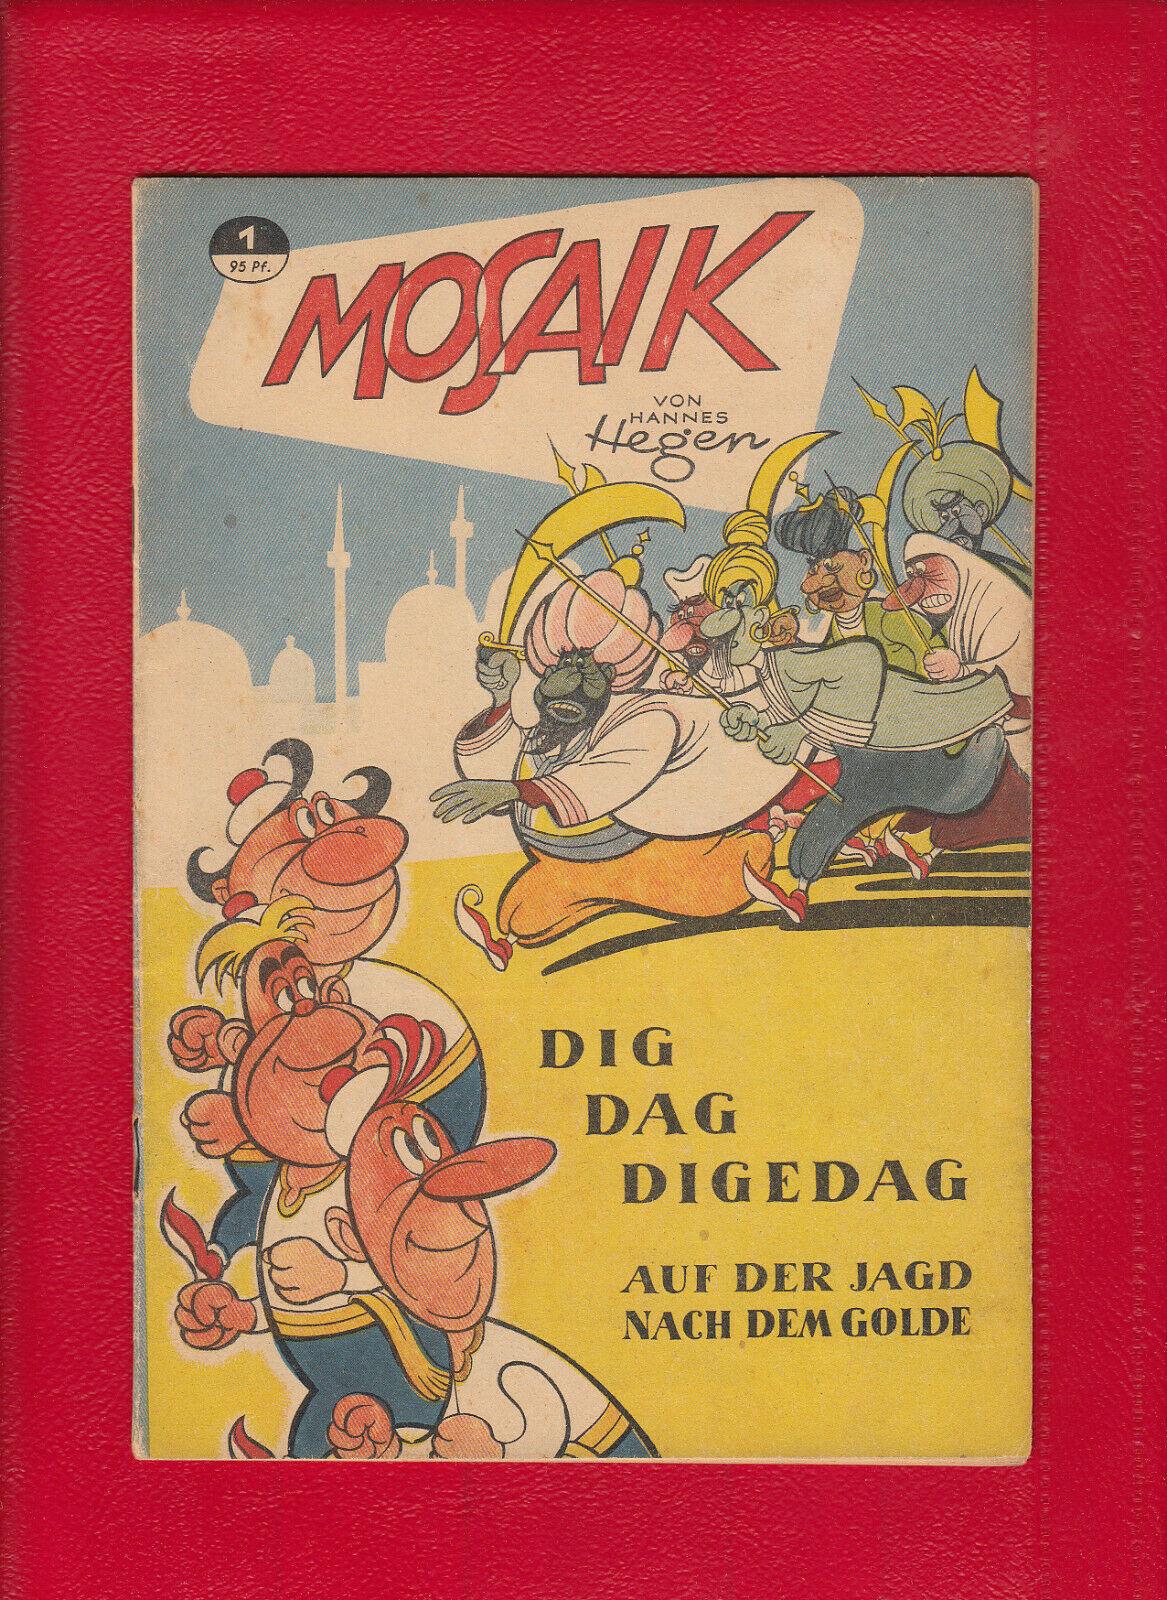 Mosaik 1 Mosaiksammlung Digedags Hannes Hegen Dig Dag Digedag